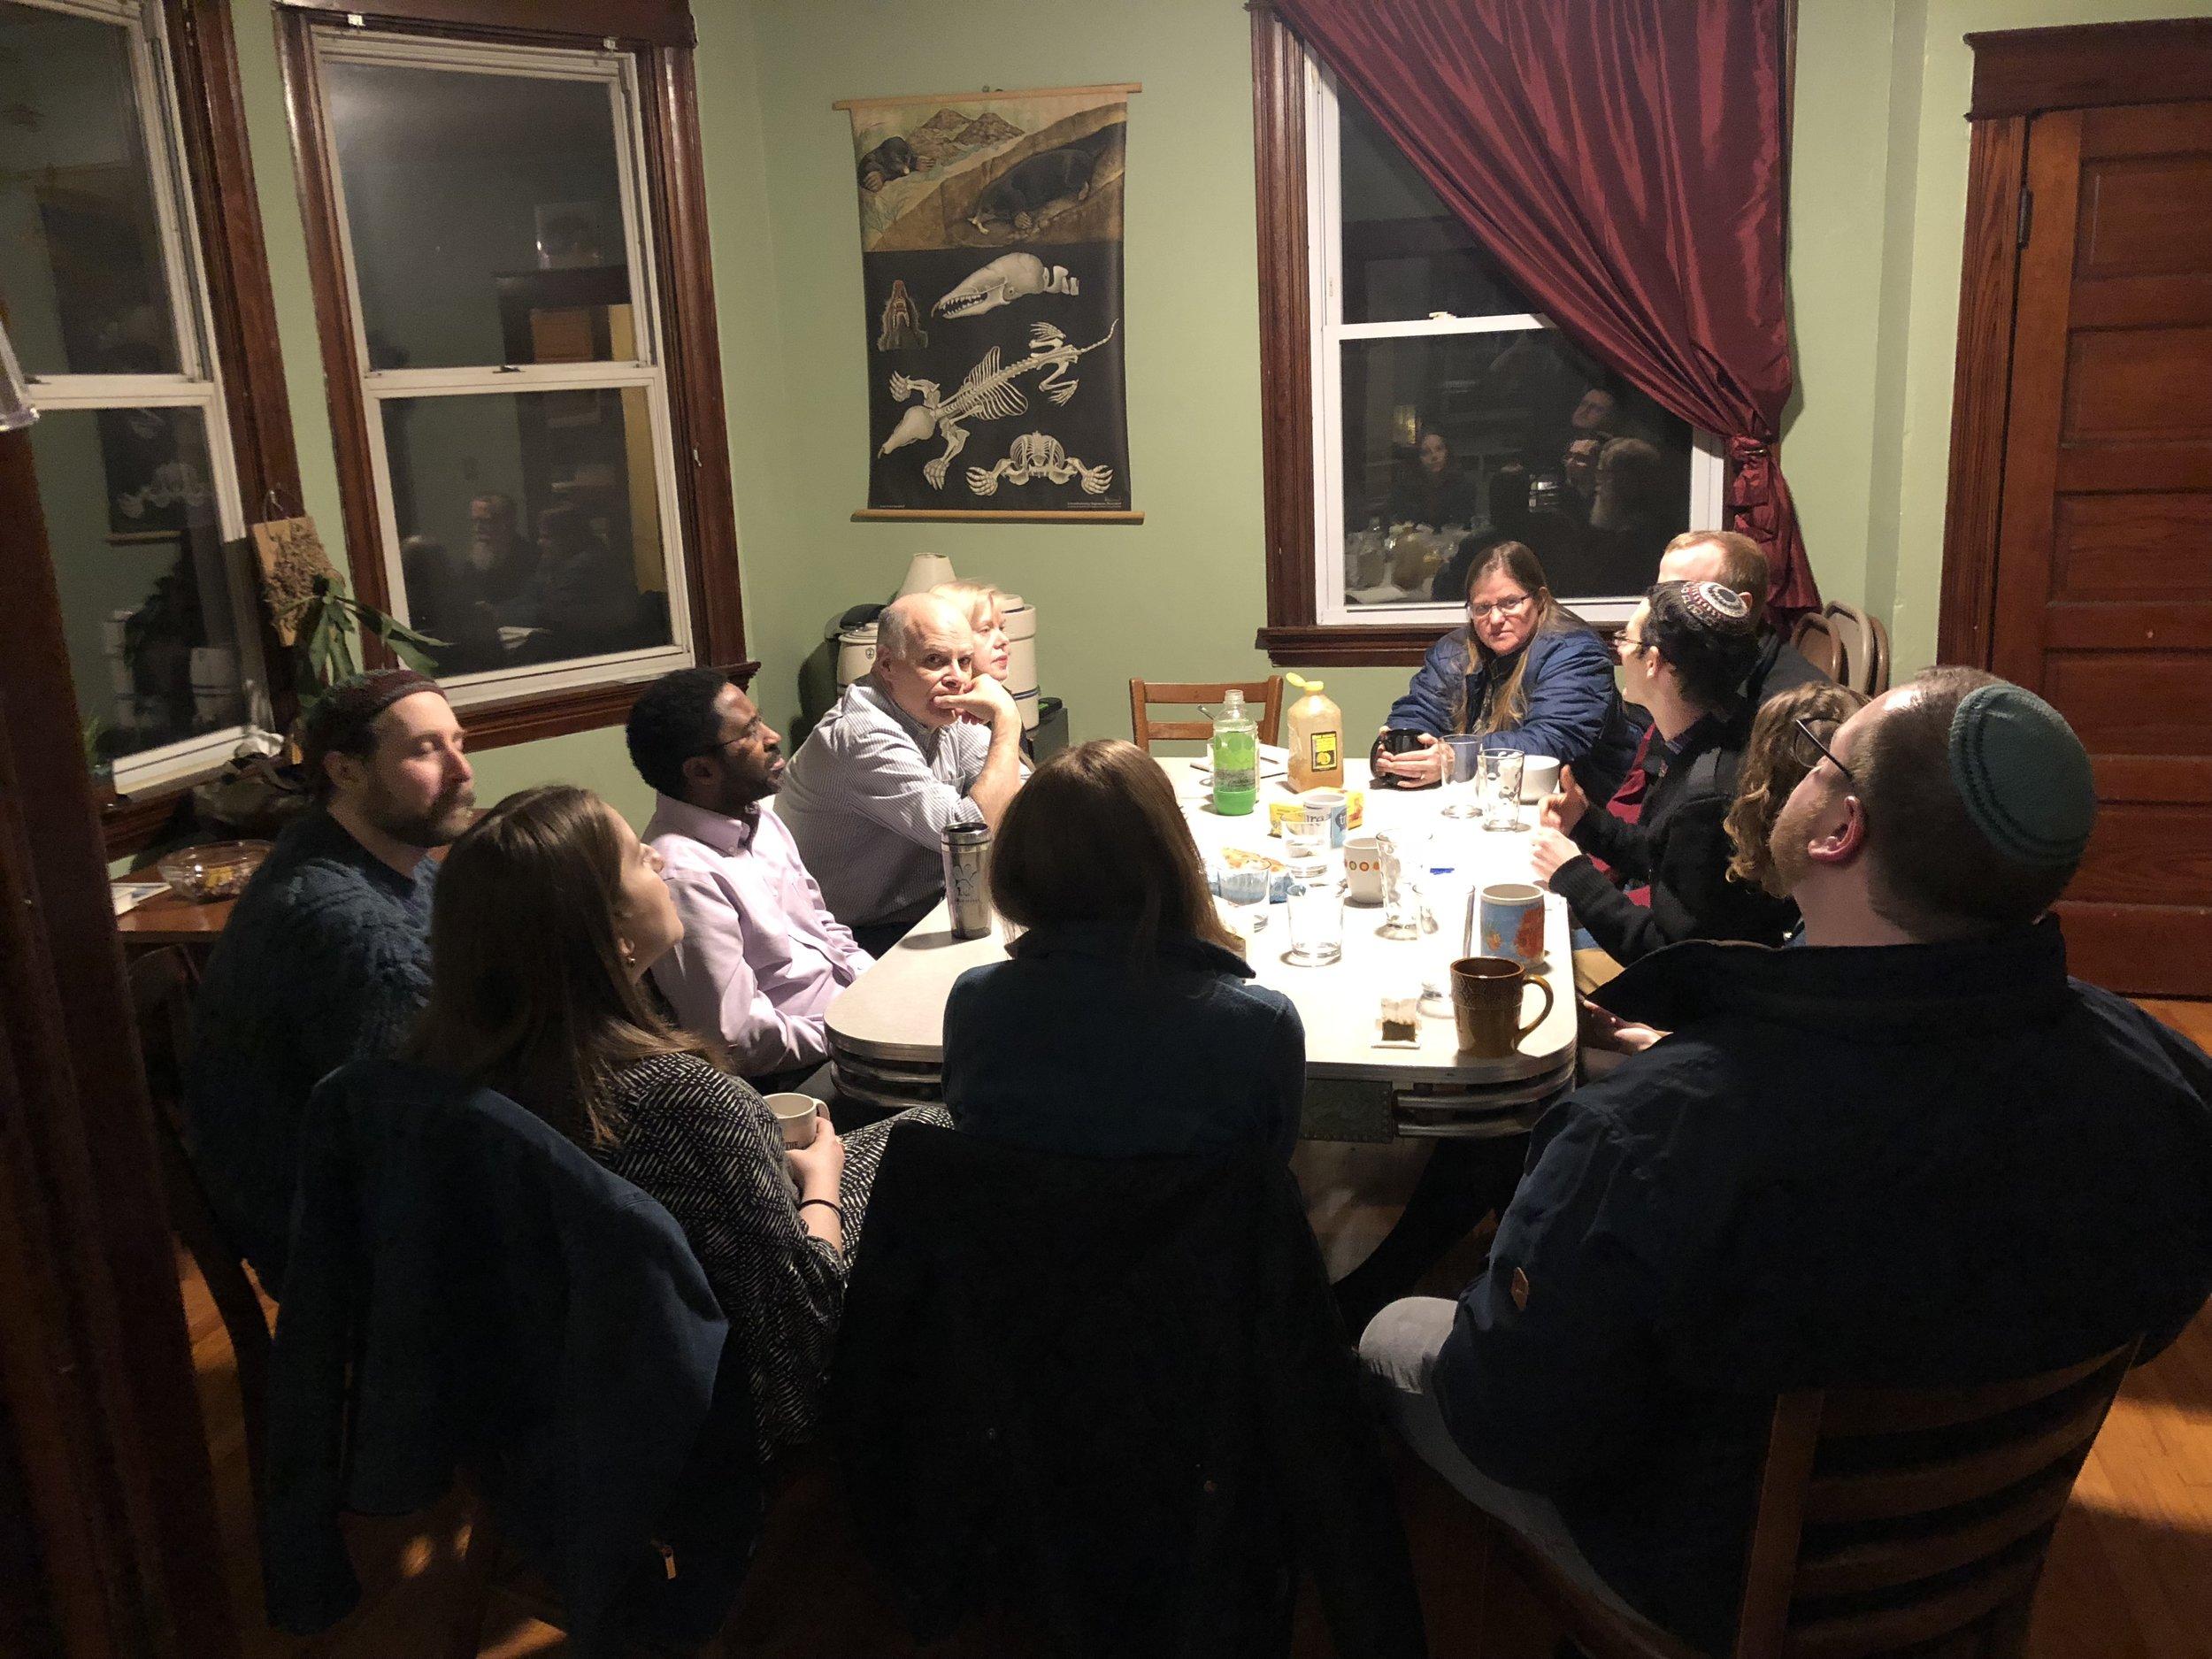 Havayahniks gather on a regular basis to learn Jewish skills, texts, and history.